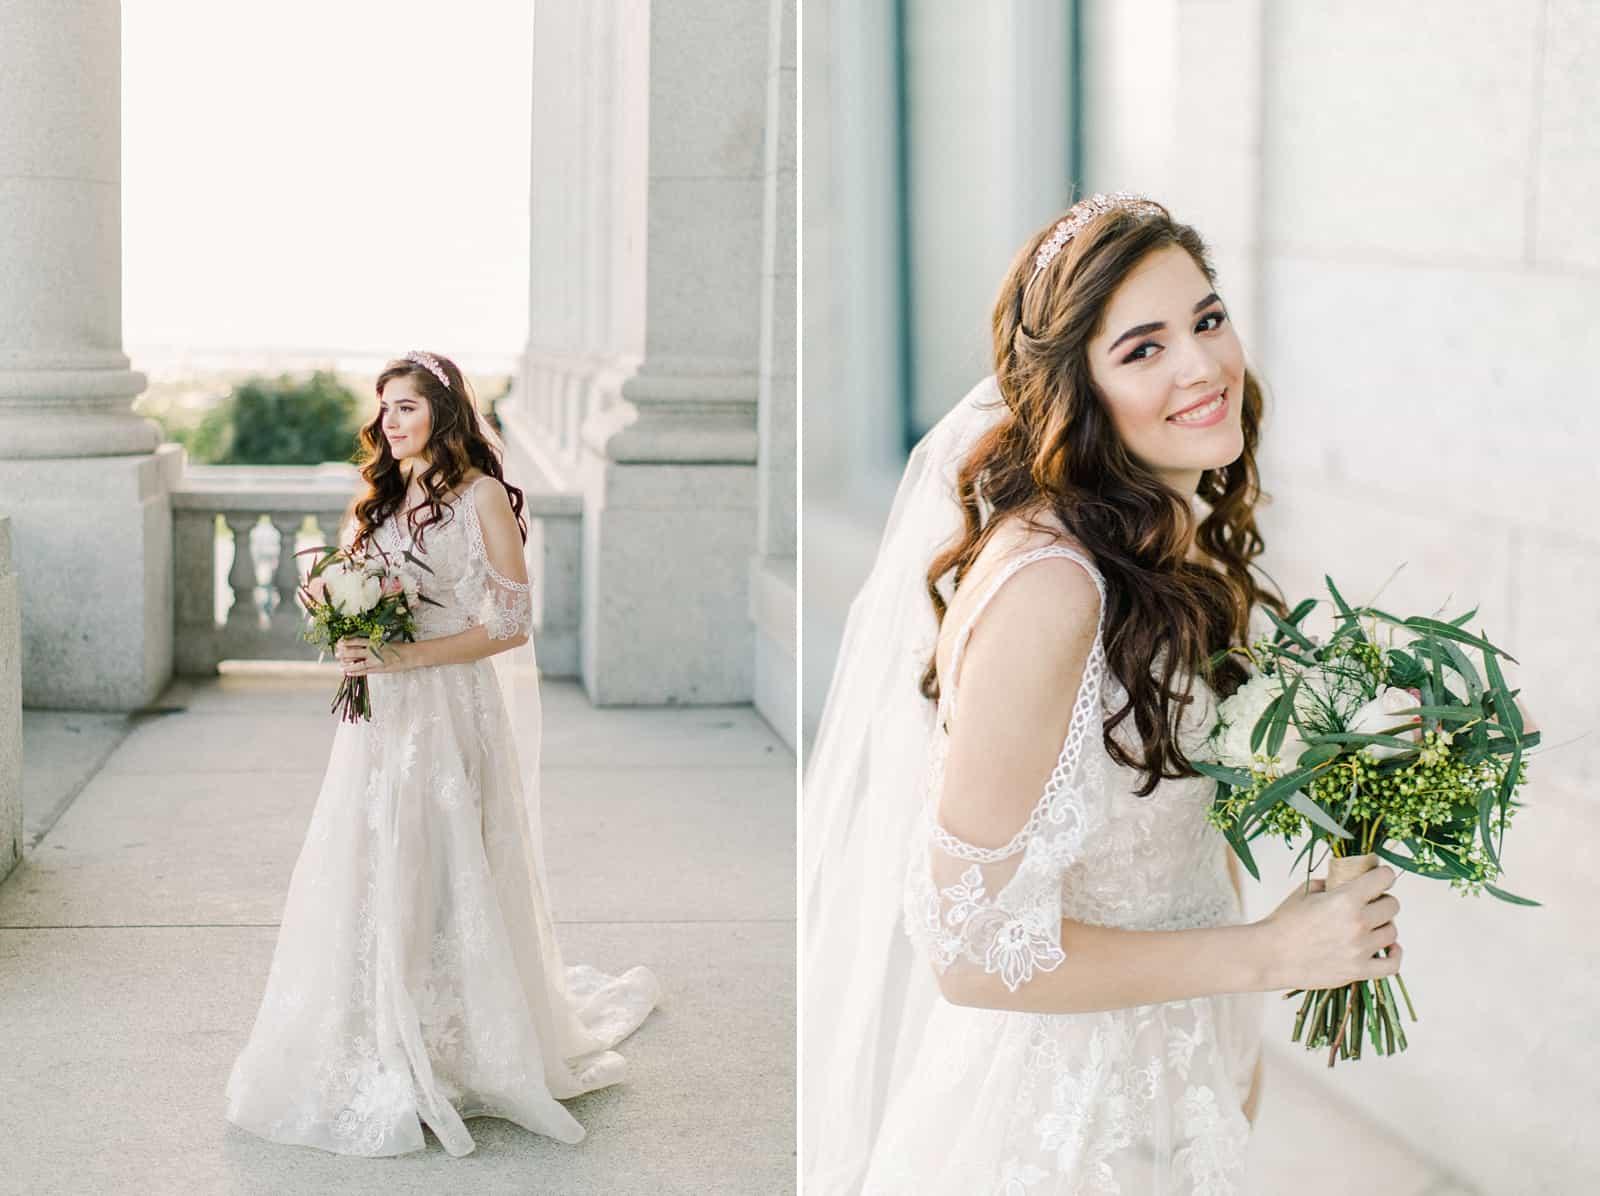 Palestinian Iranian Bride and Groom, Utah Wedding Photography at the Utah State Capitol, beautiful bride boho lace wedding dress